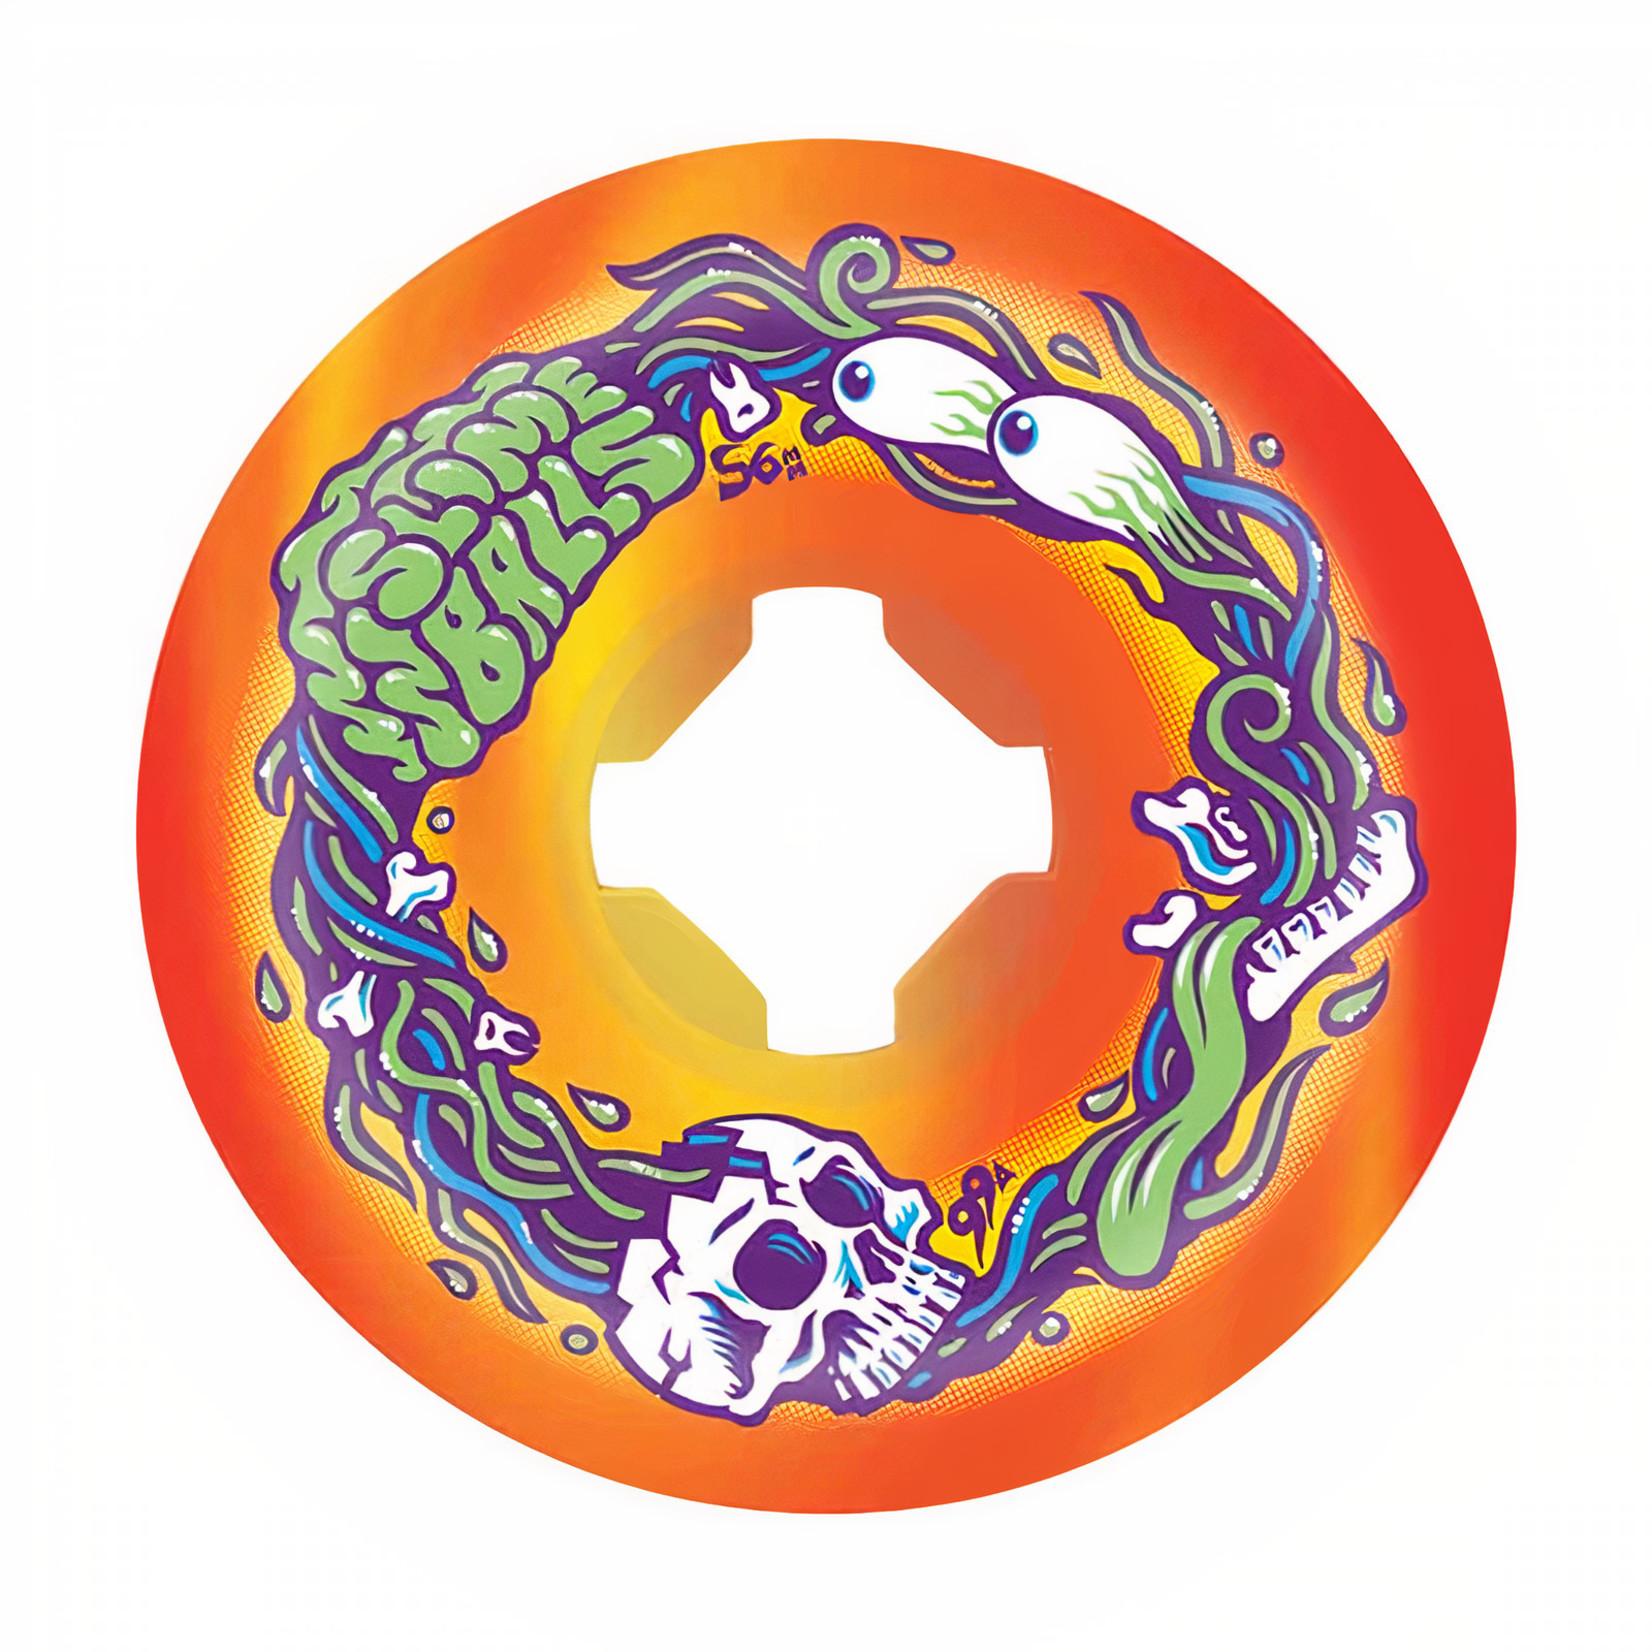 Slime Balls Slime Balls - Wheels - 99a Brains Speed Balls - Orange / Yellow 56mm